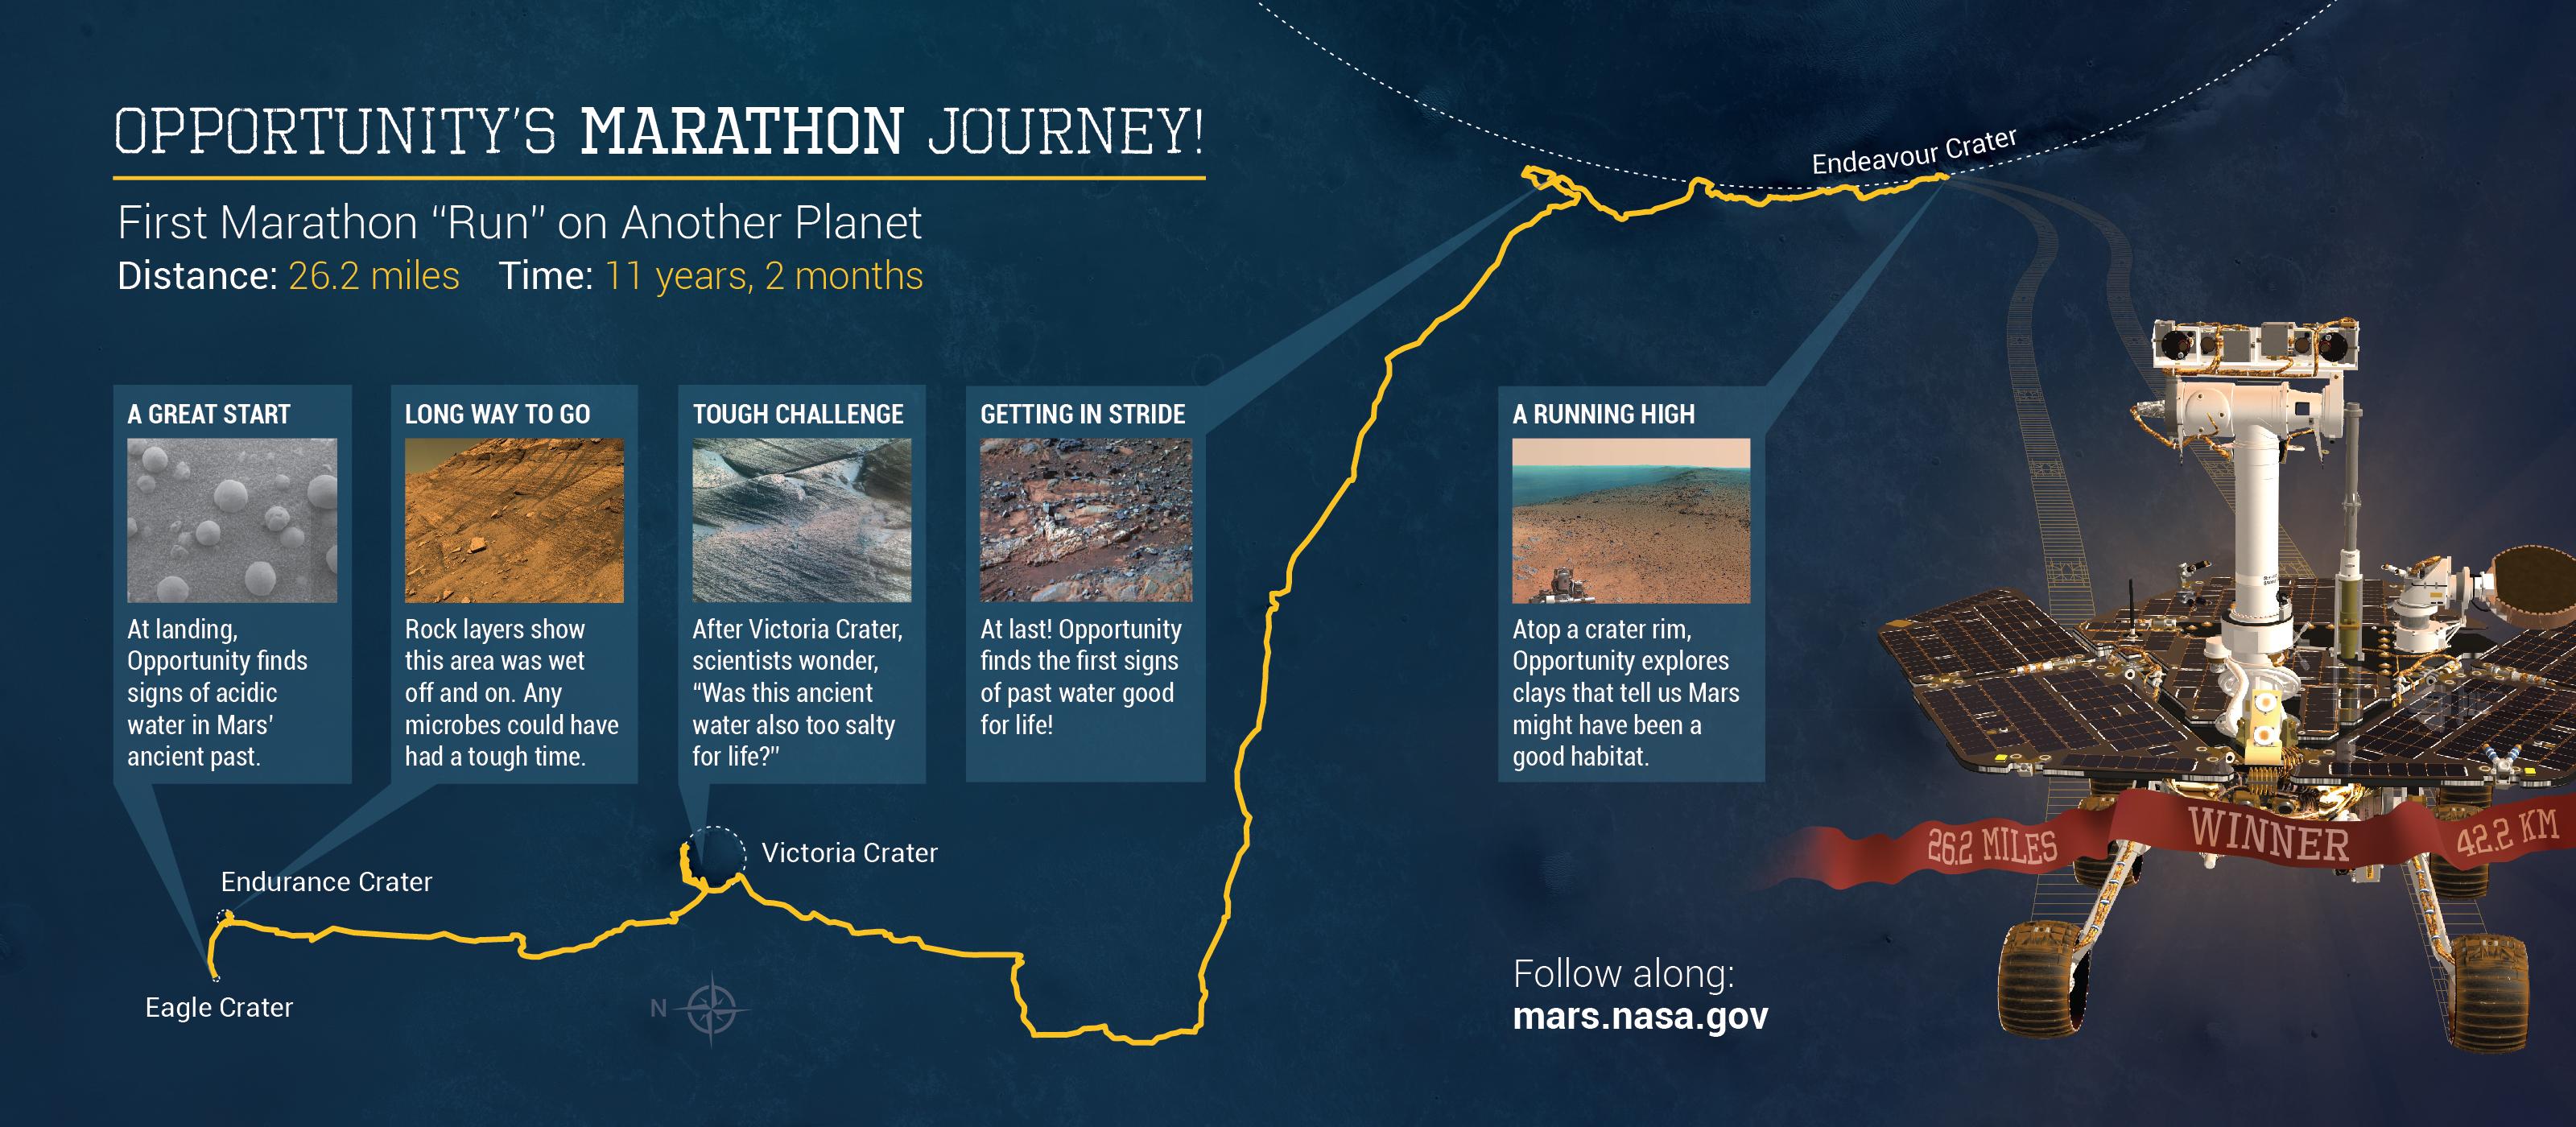 mars-rover-opportunity-marathon-journey-run-PIA19158